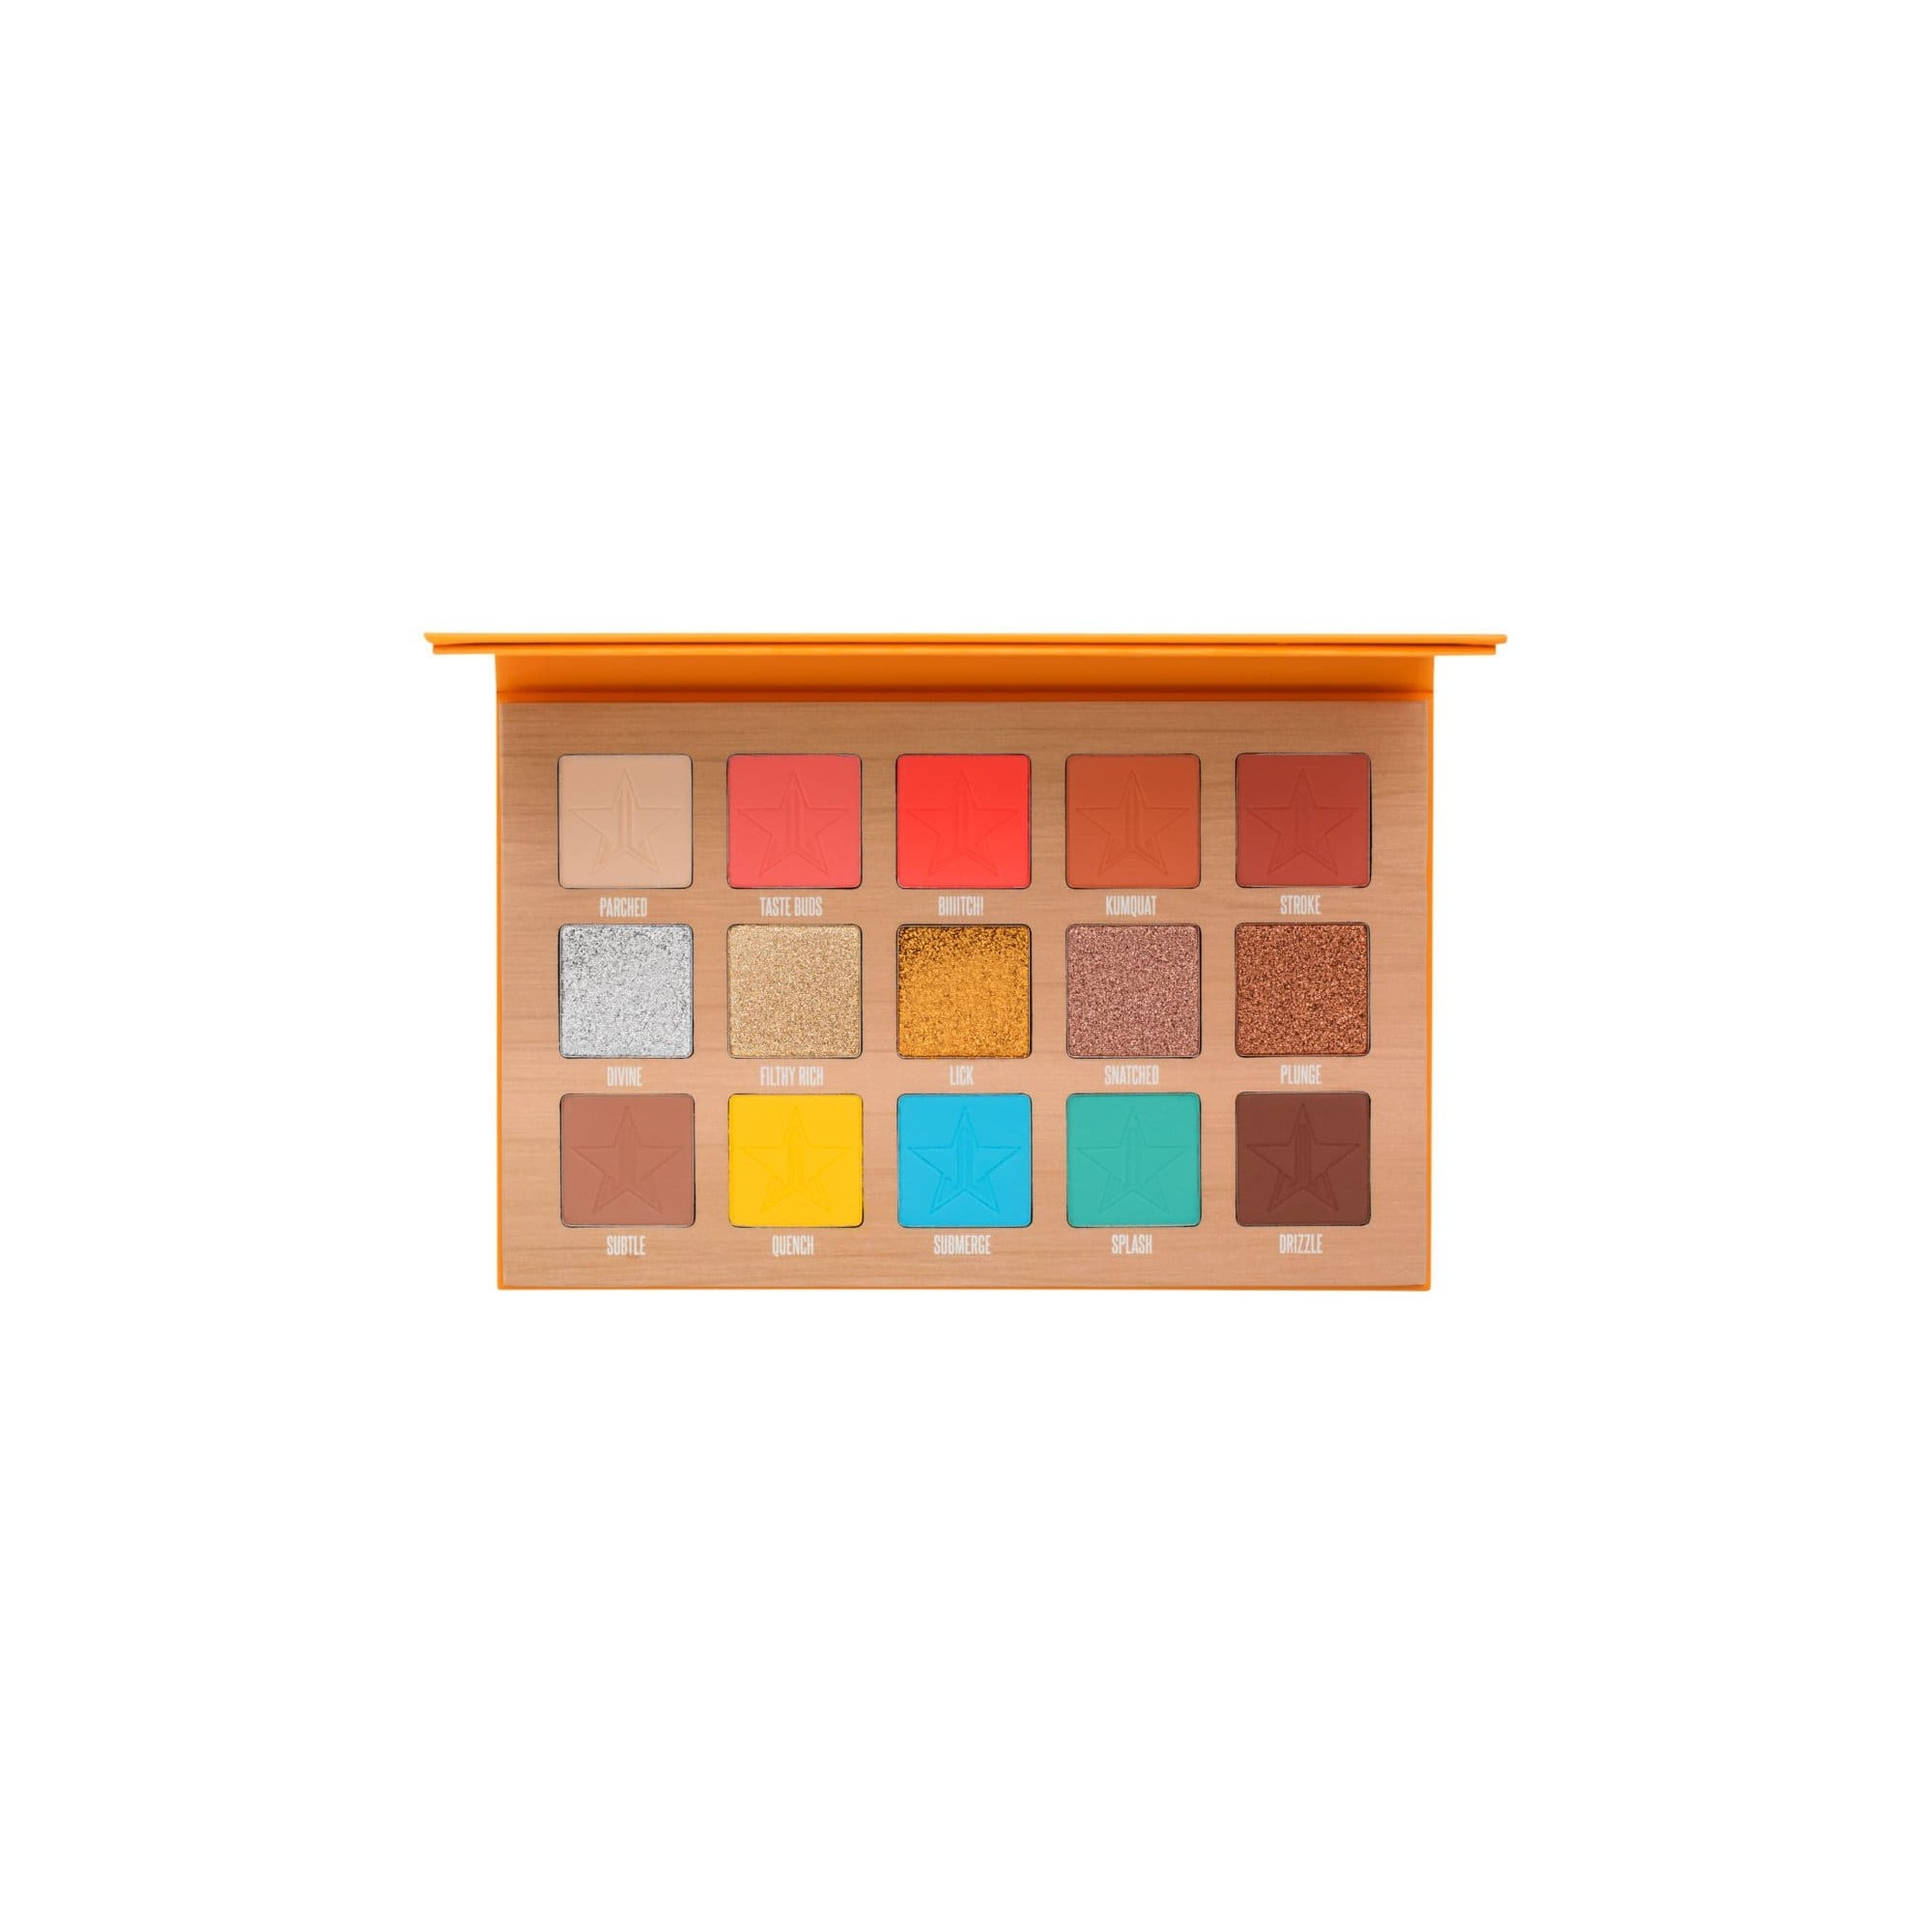 Jeffree Star Cosmetics Thirsty Eyeshadow Palette